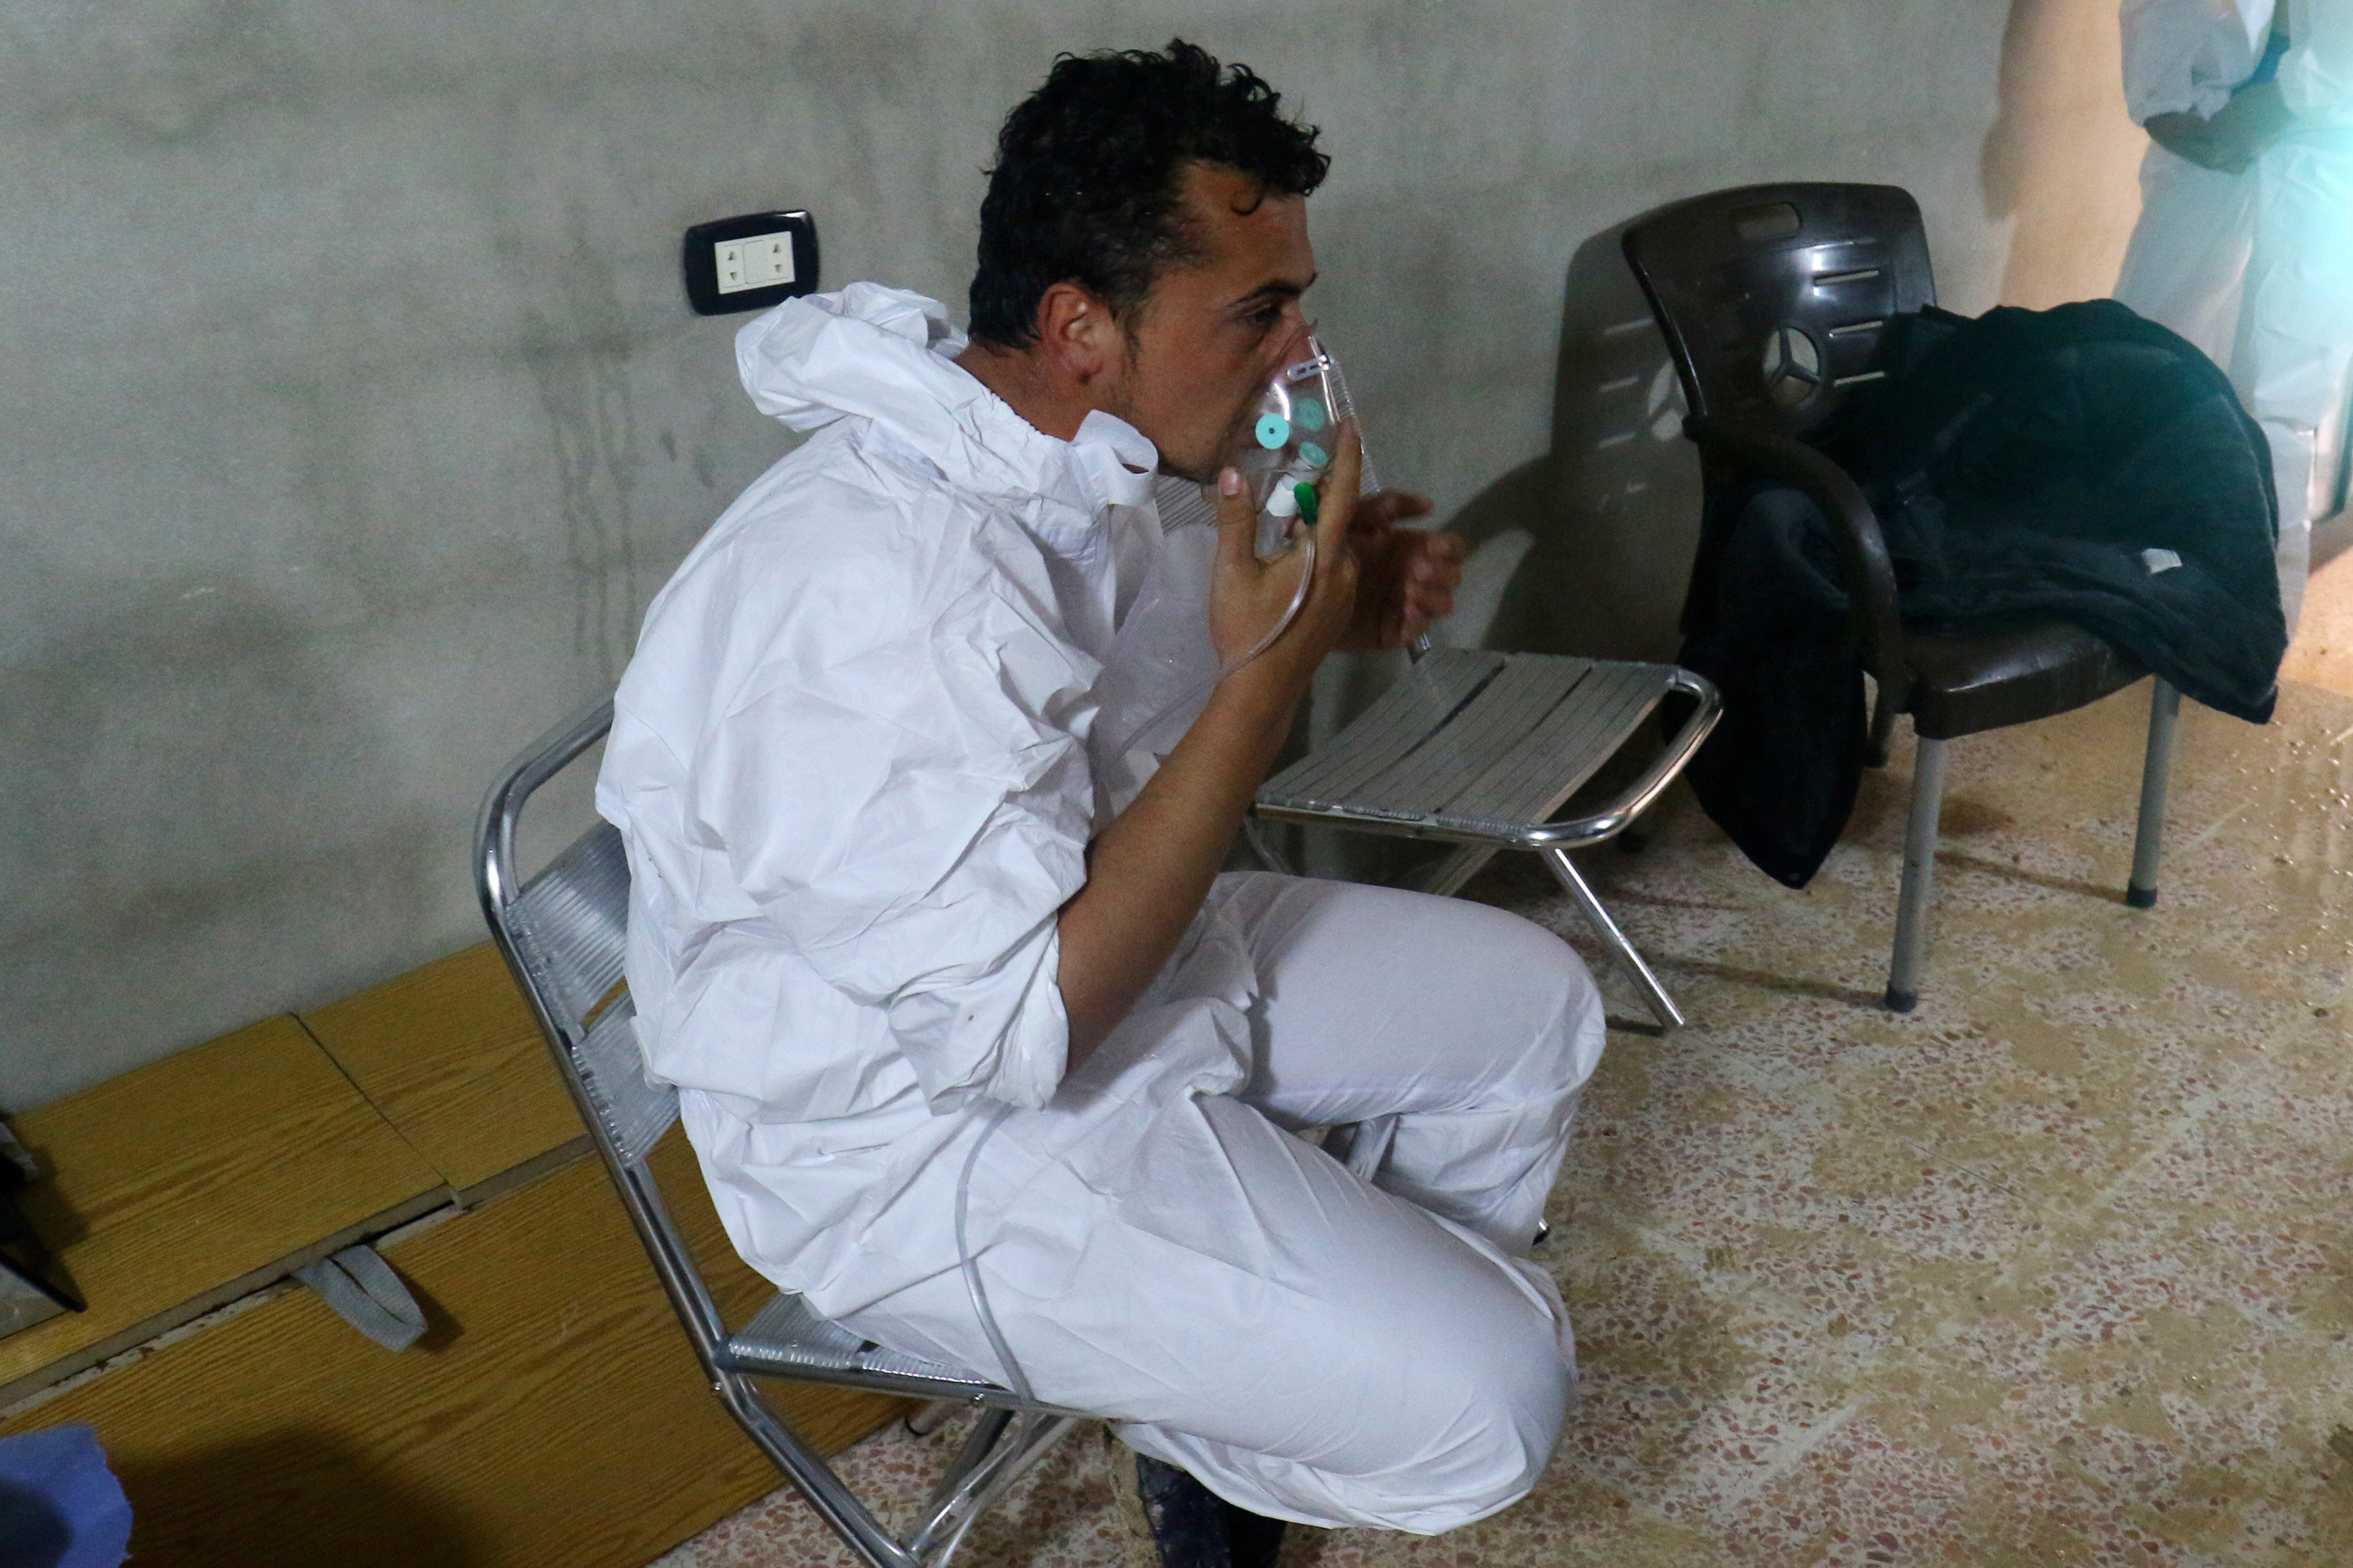 2017 04 04T095510Z 967331583 RC15D958AC40 RTRMADP 3 MIDEAST CRISIS SYRIA IDLIB